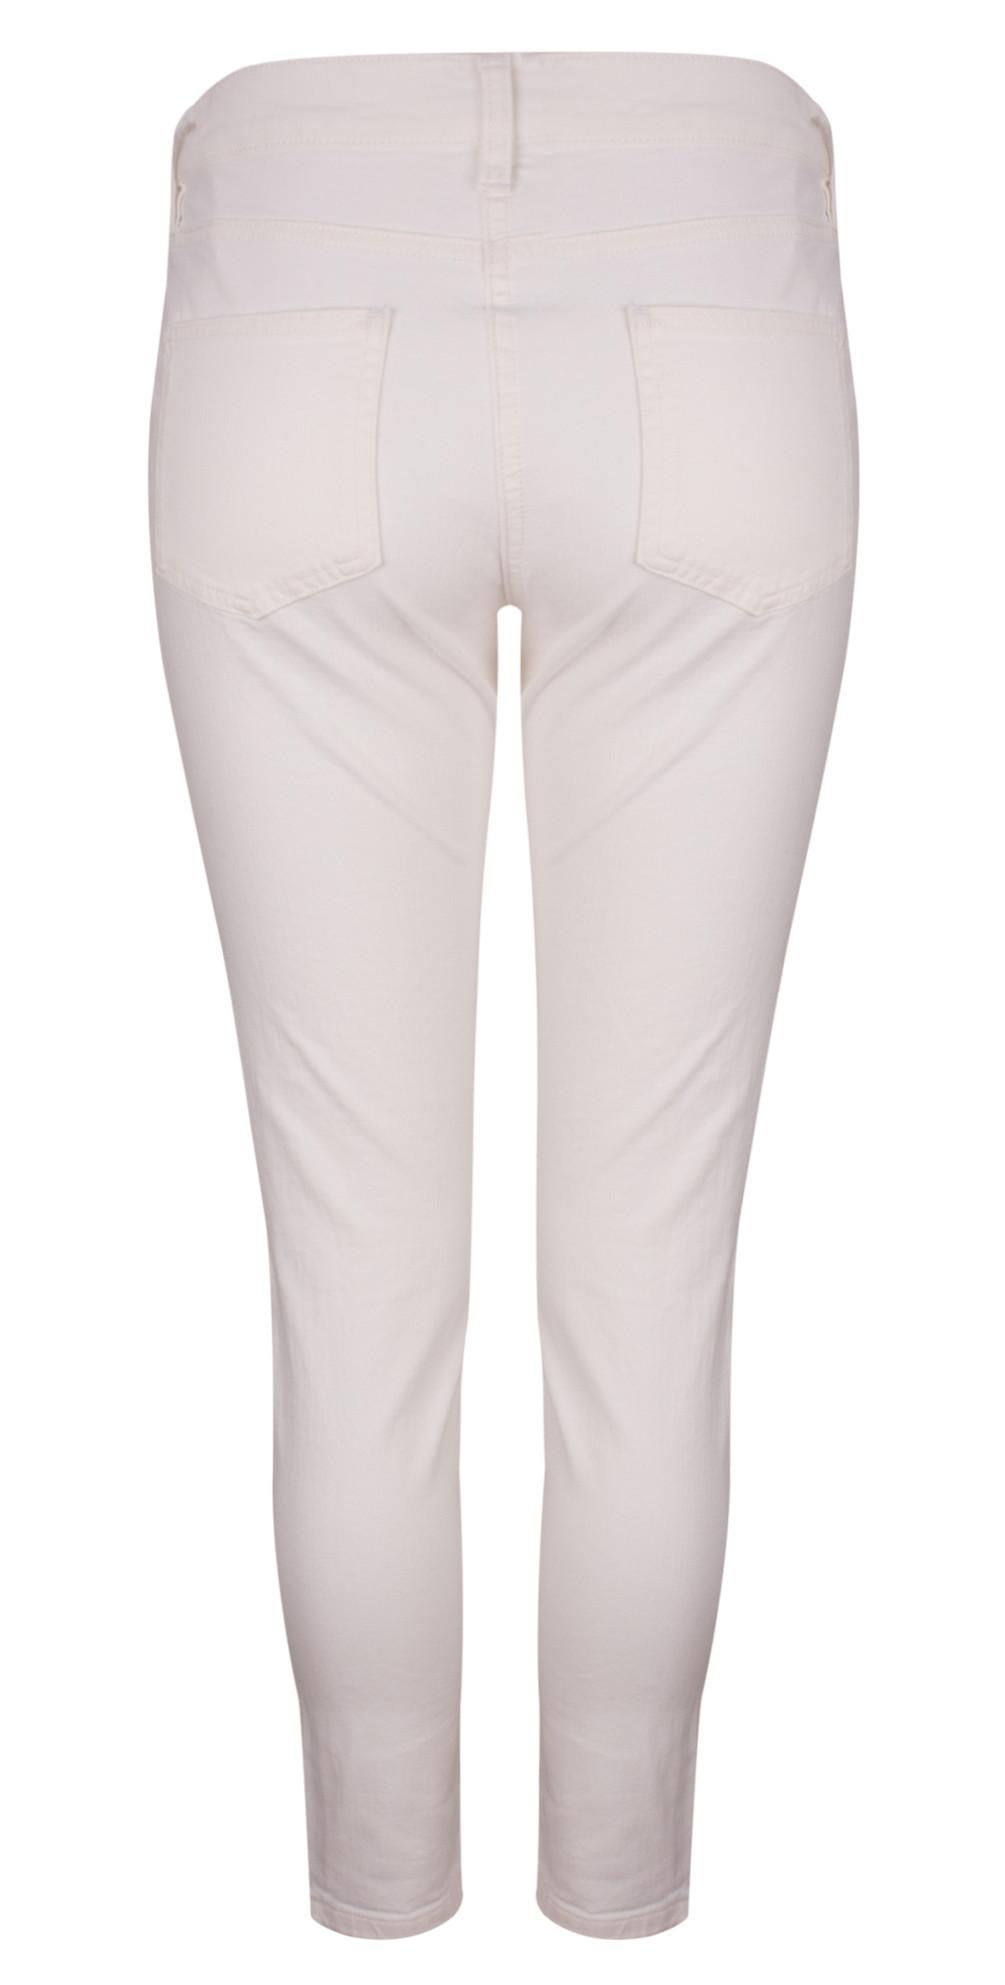 Blanco Denim Skinny Jeans main image